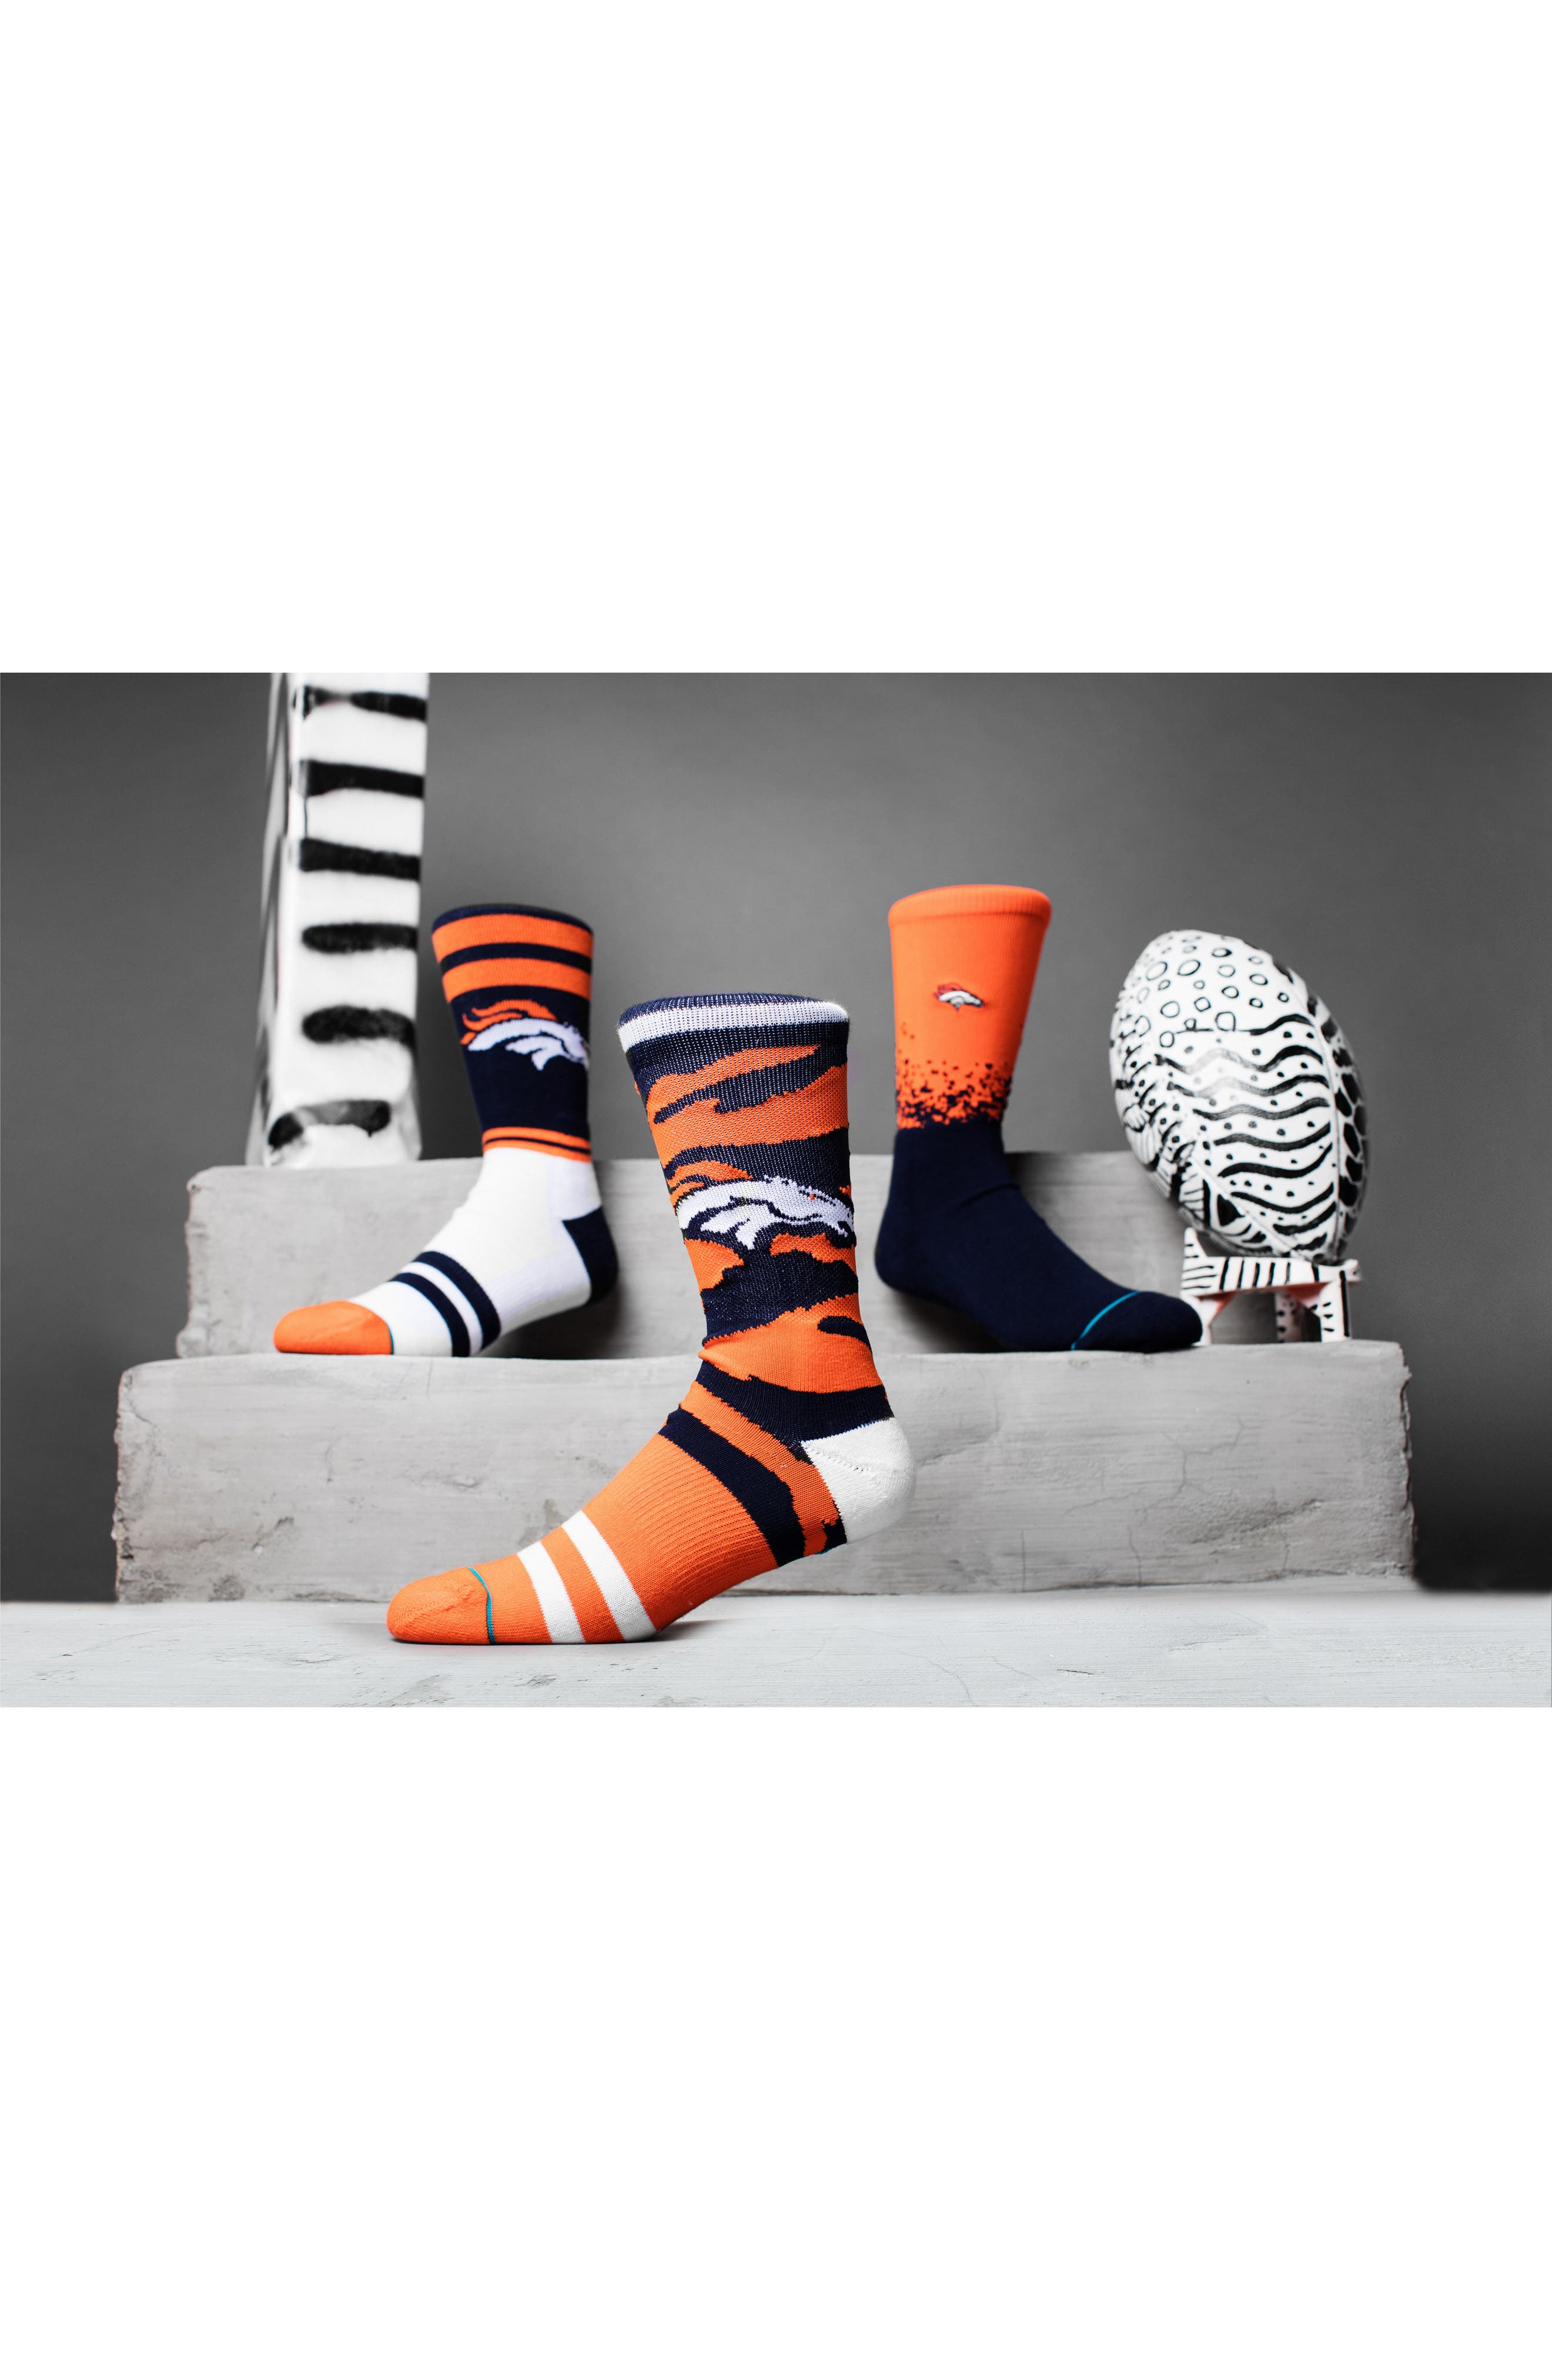 Denver Broncos - Fade Socks,                             Alternate thumbnail 3, color,                             Navy